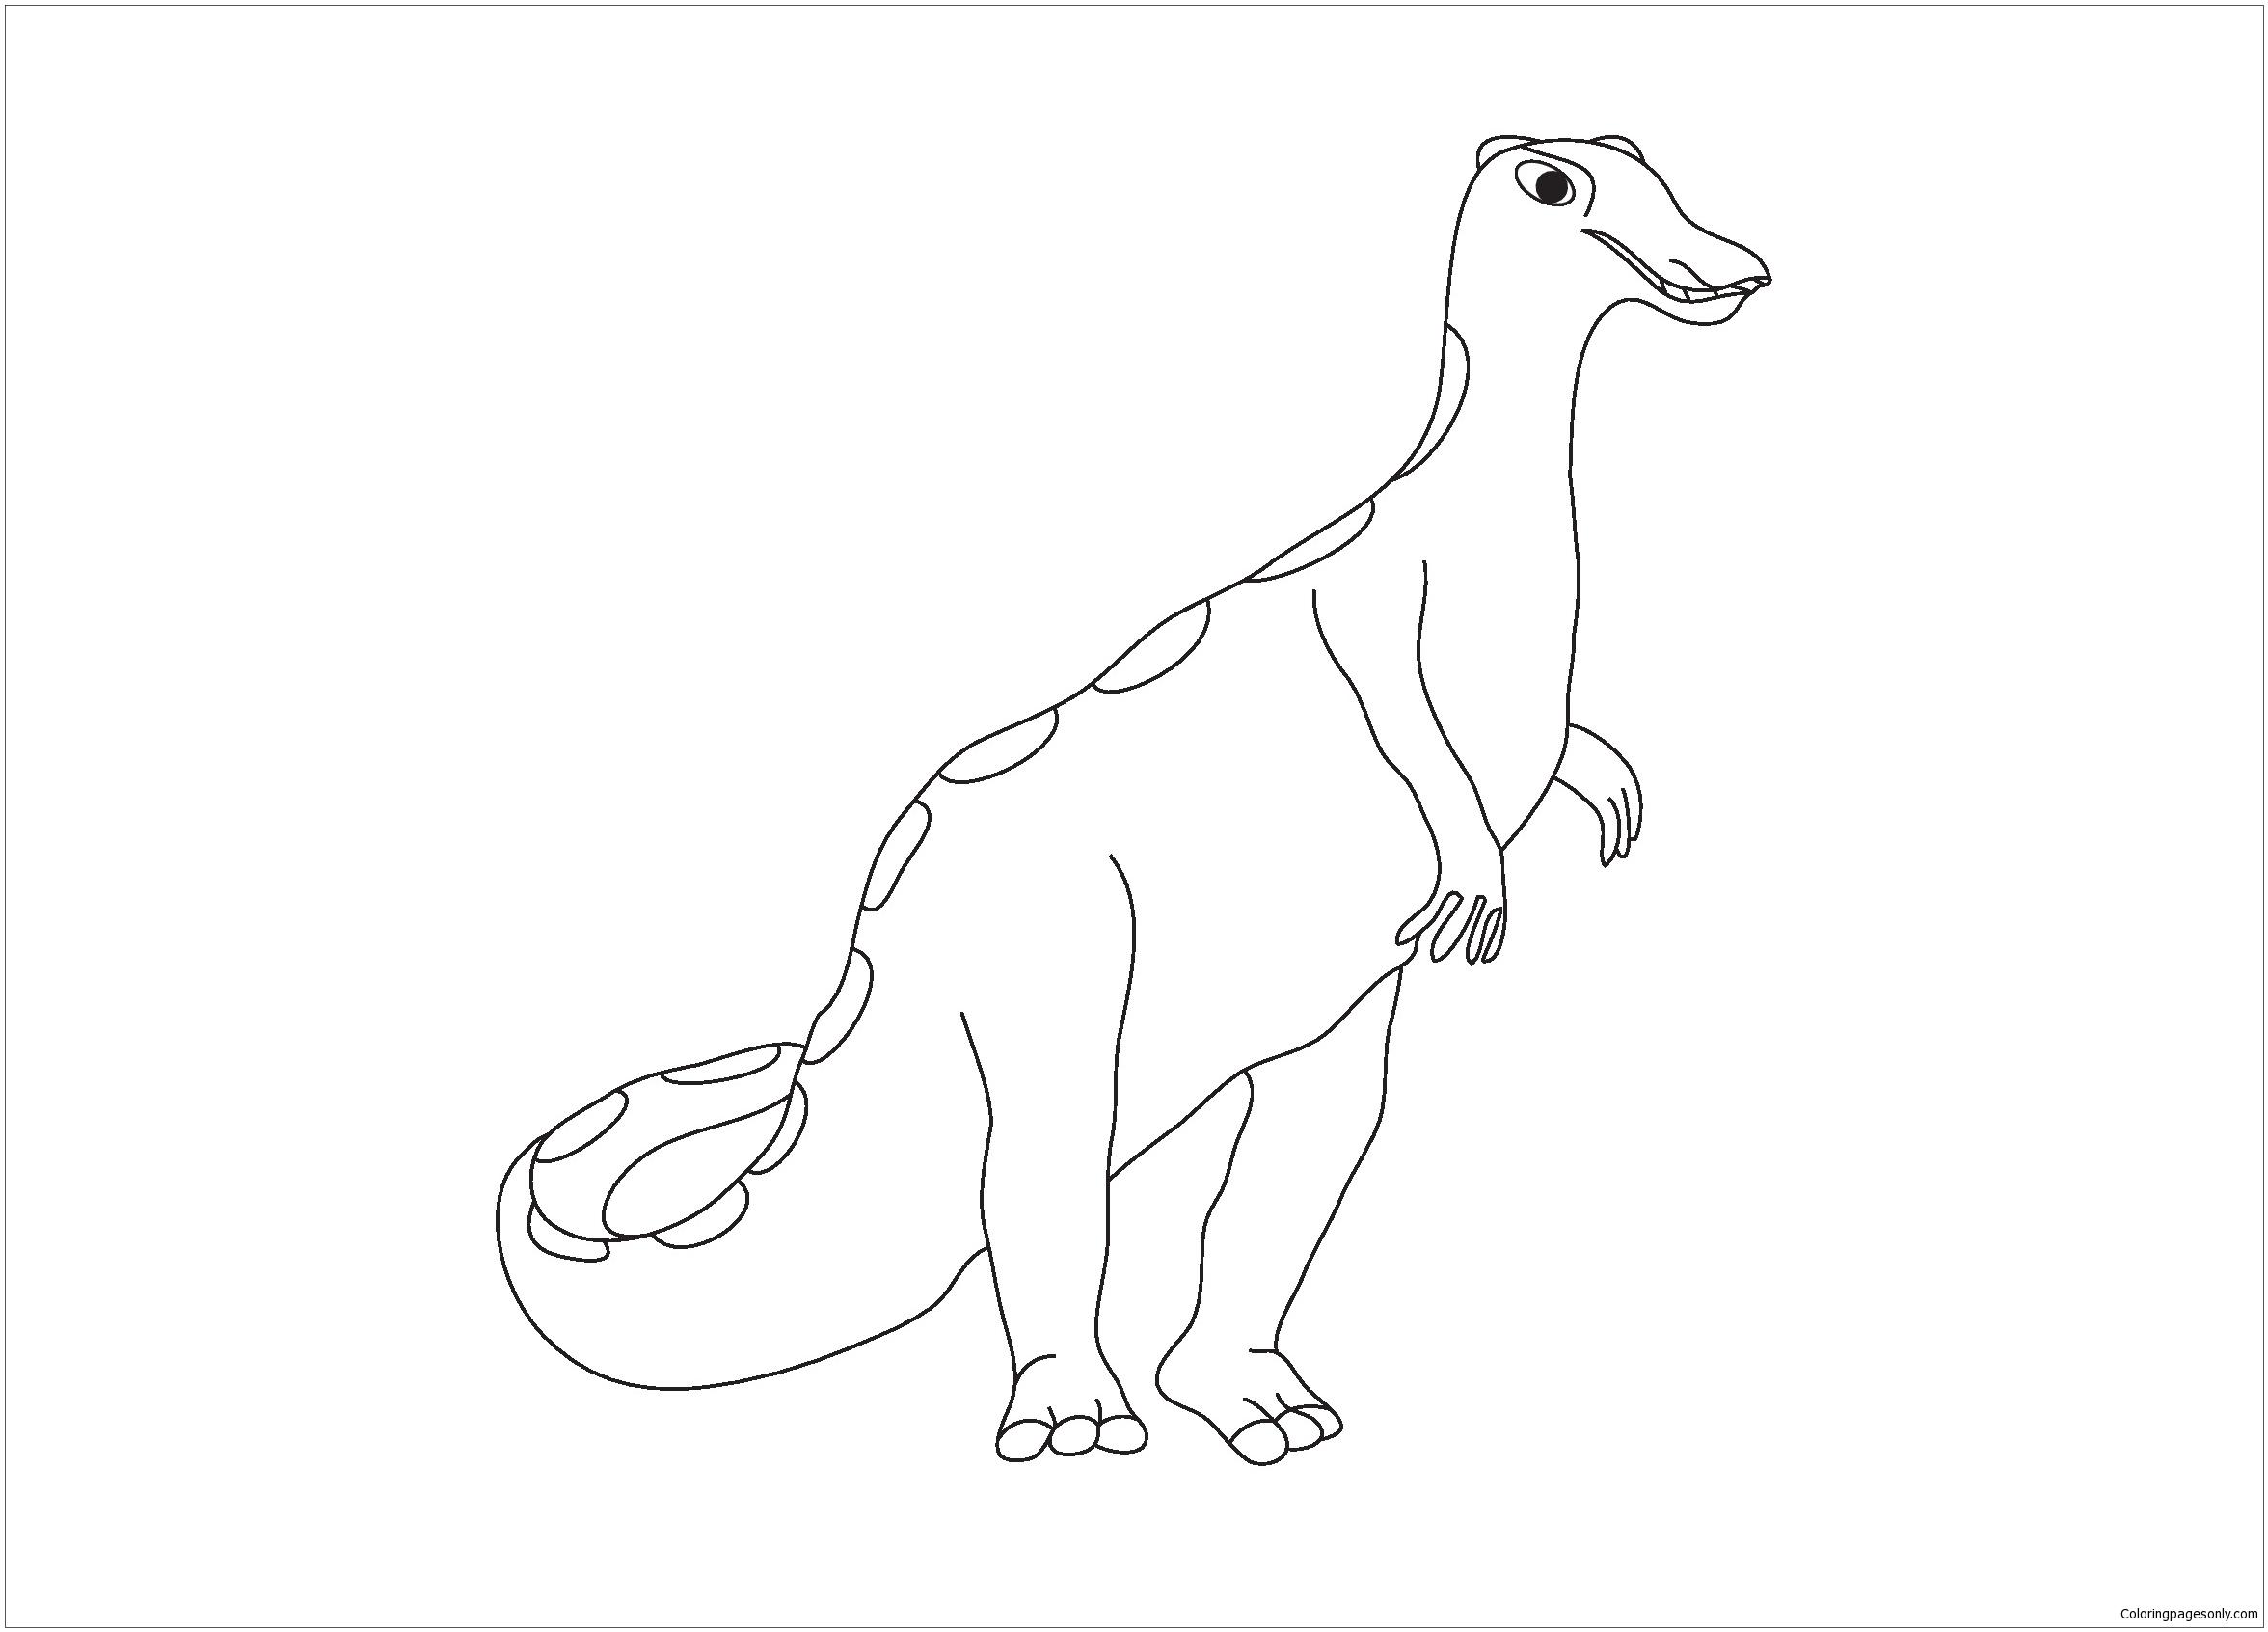 Camptosaurus Dinosaur 2 Coloring Page